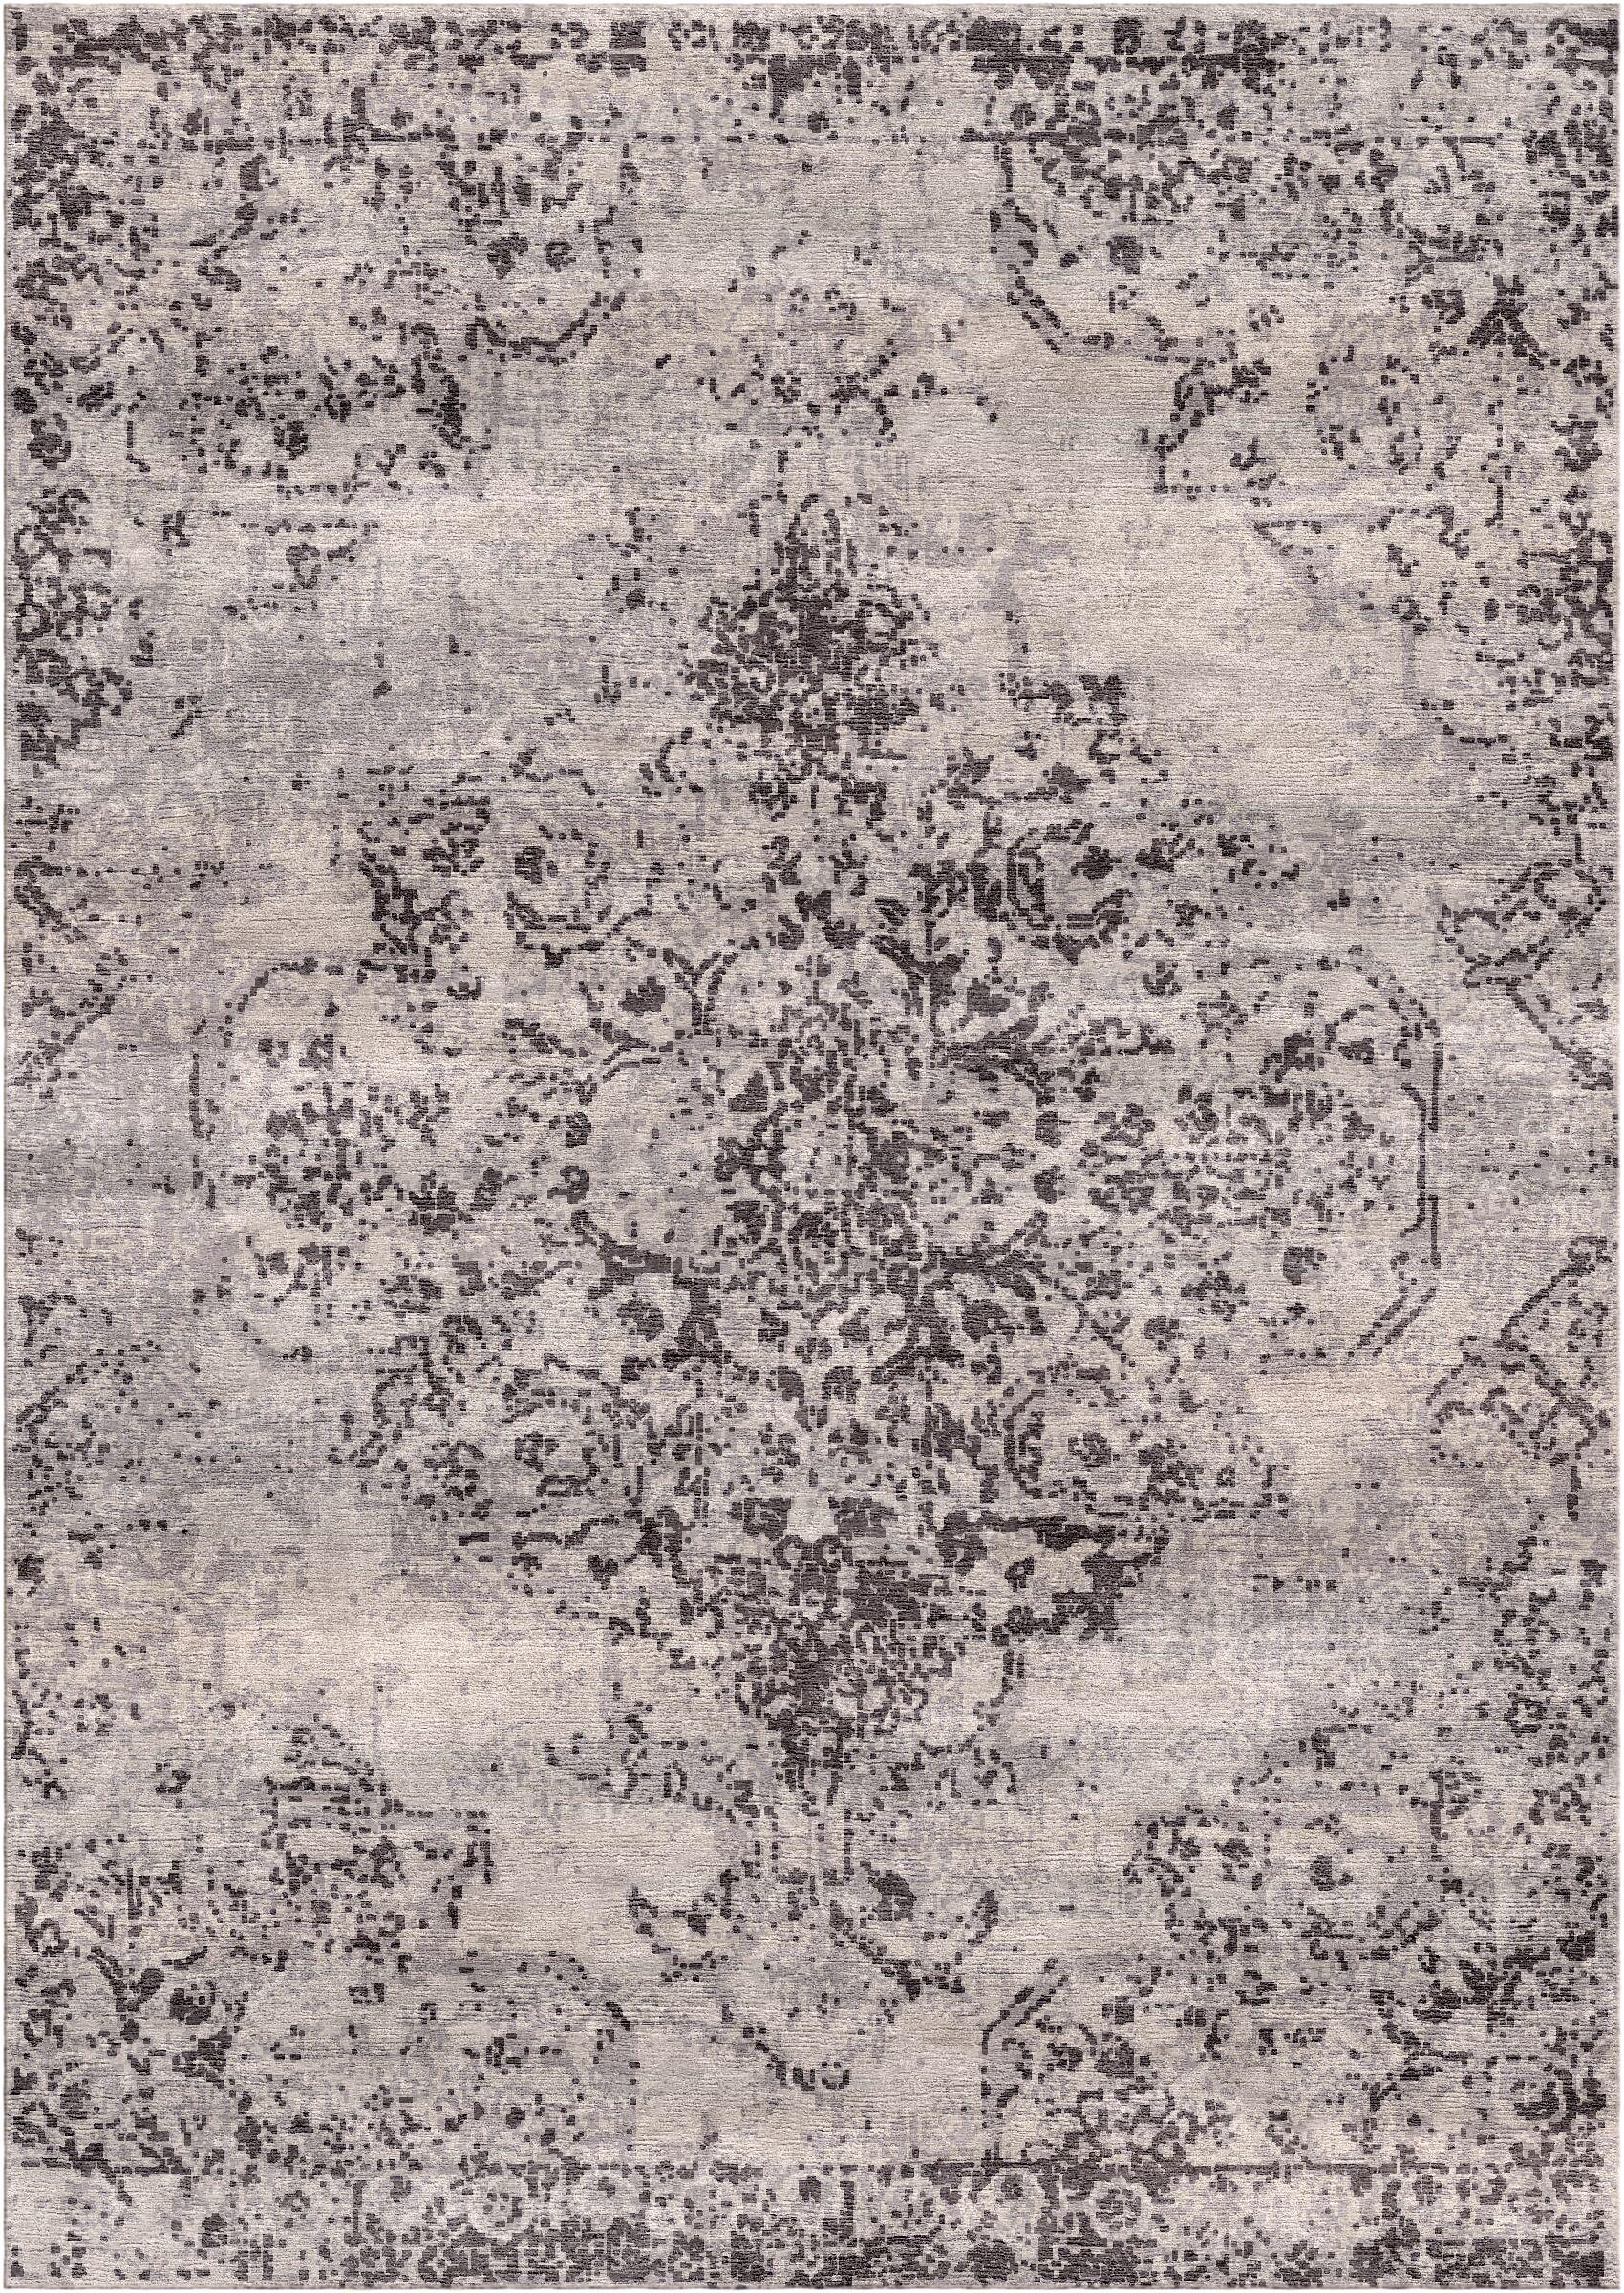 Aliza Handloom Beige/Brown Area Rug Rug Size: Rectangle 8' x 10'